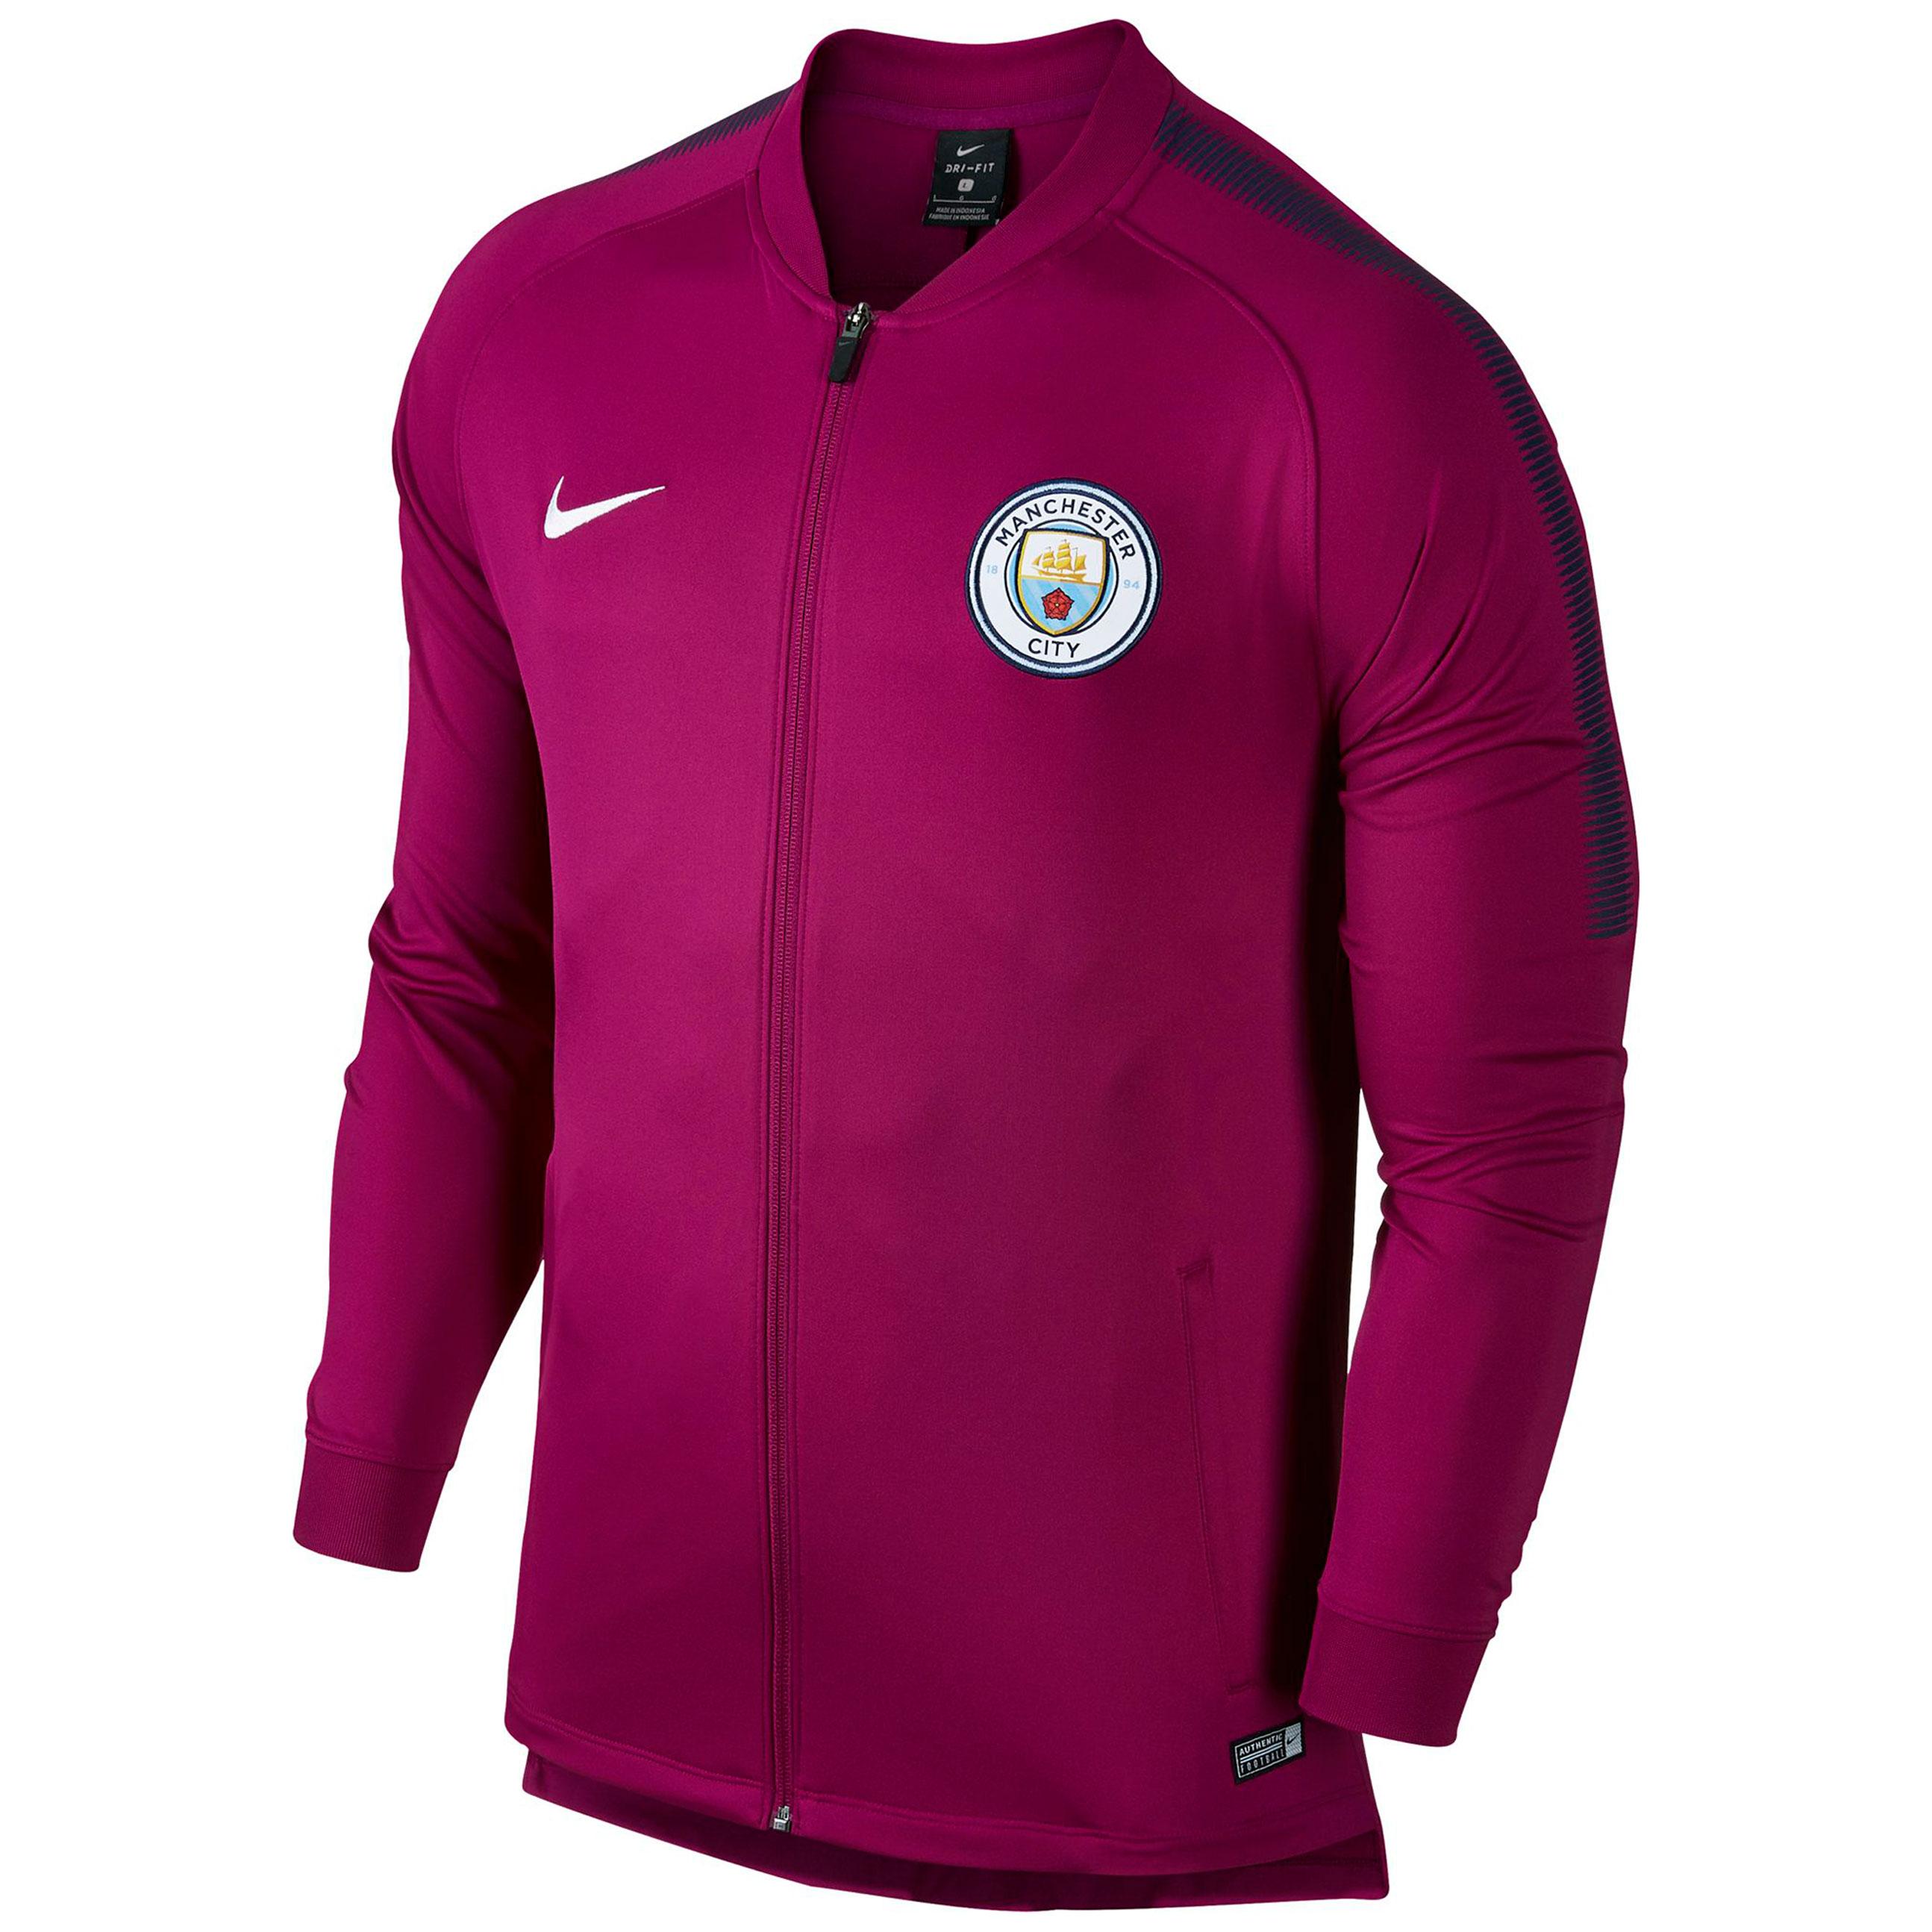 Manchester City Squad Track Jacket - Maroon